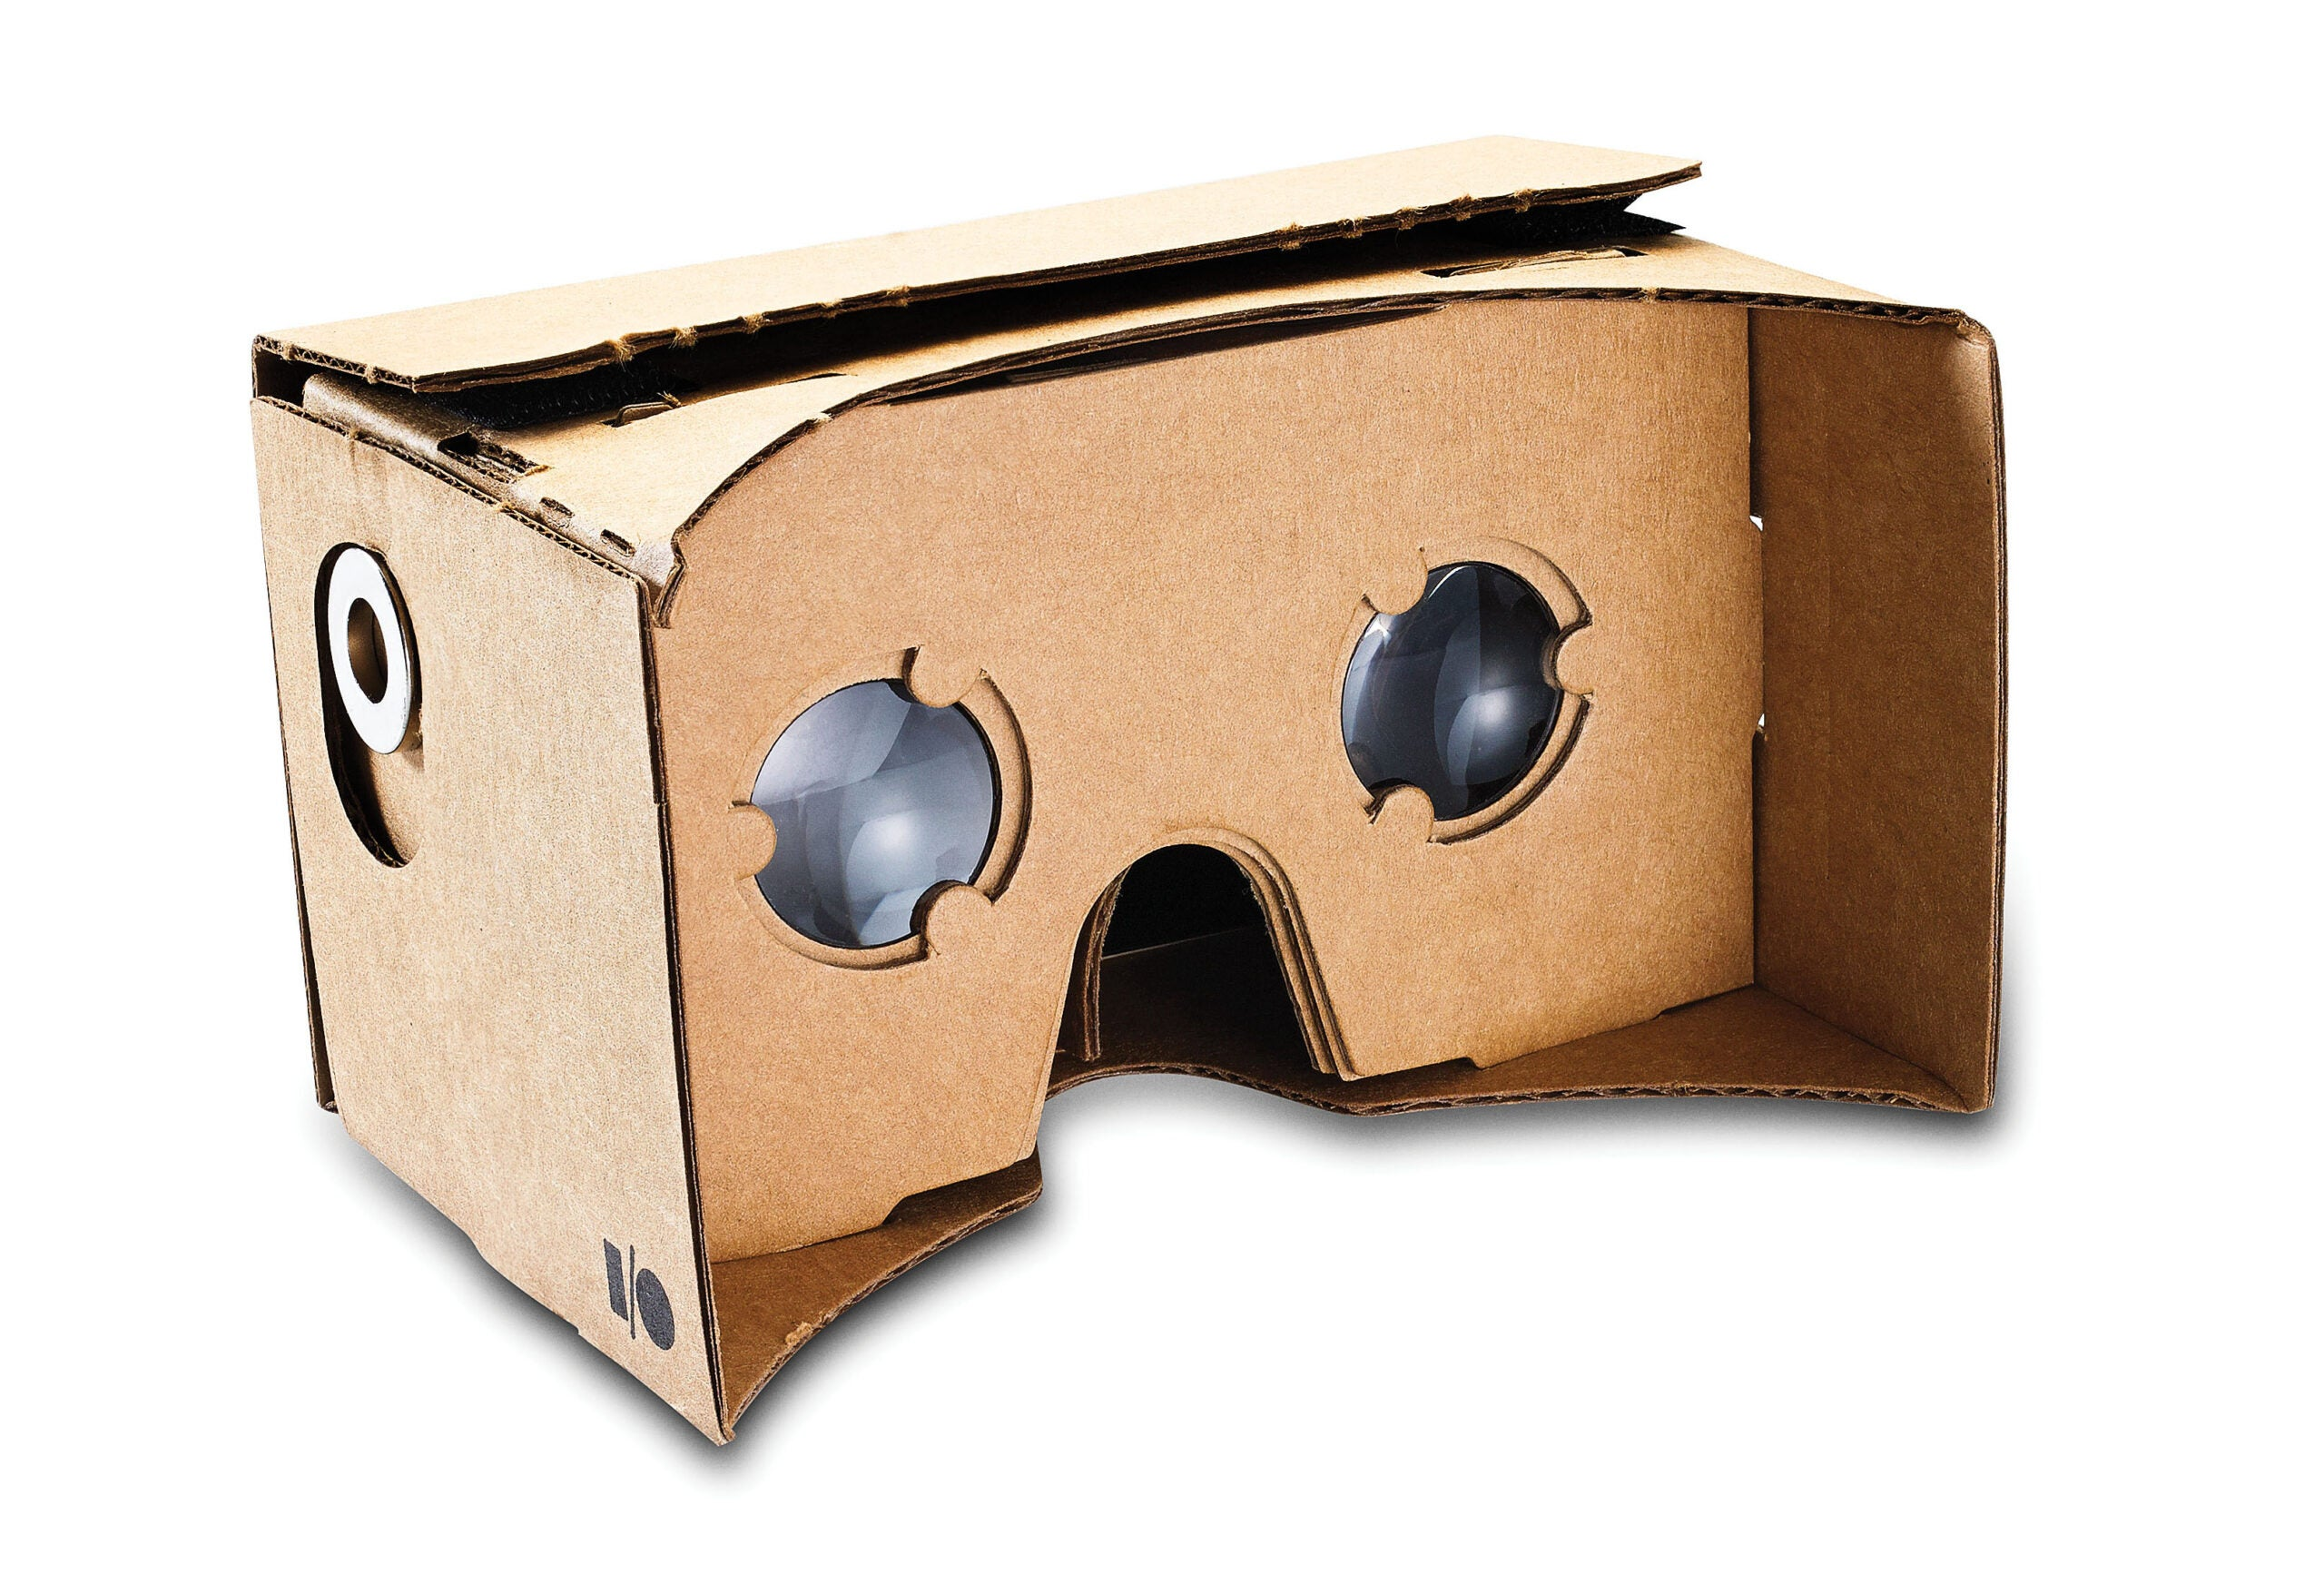 Google Cardboard Is Virtual Reality On A Budget